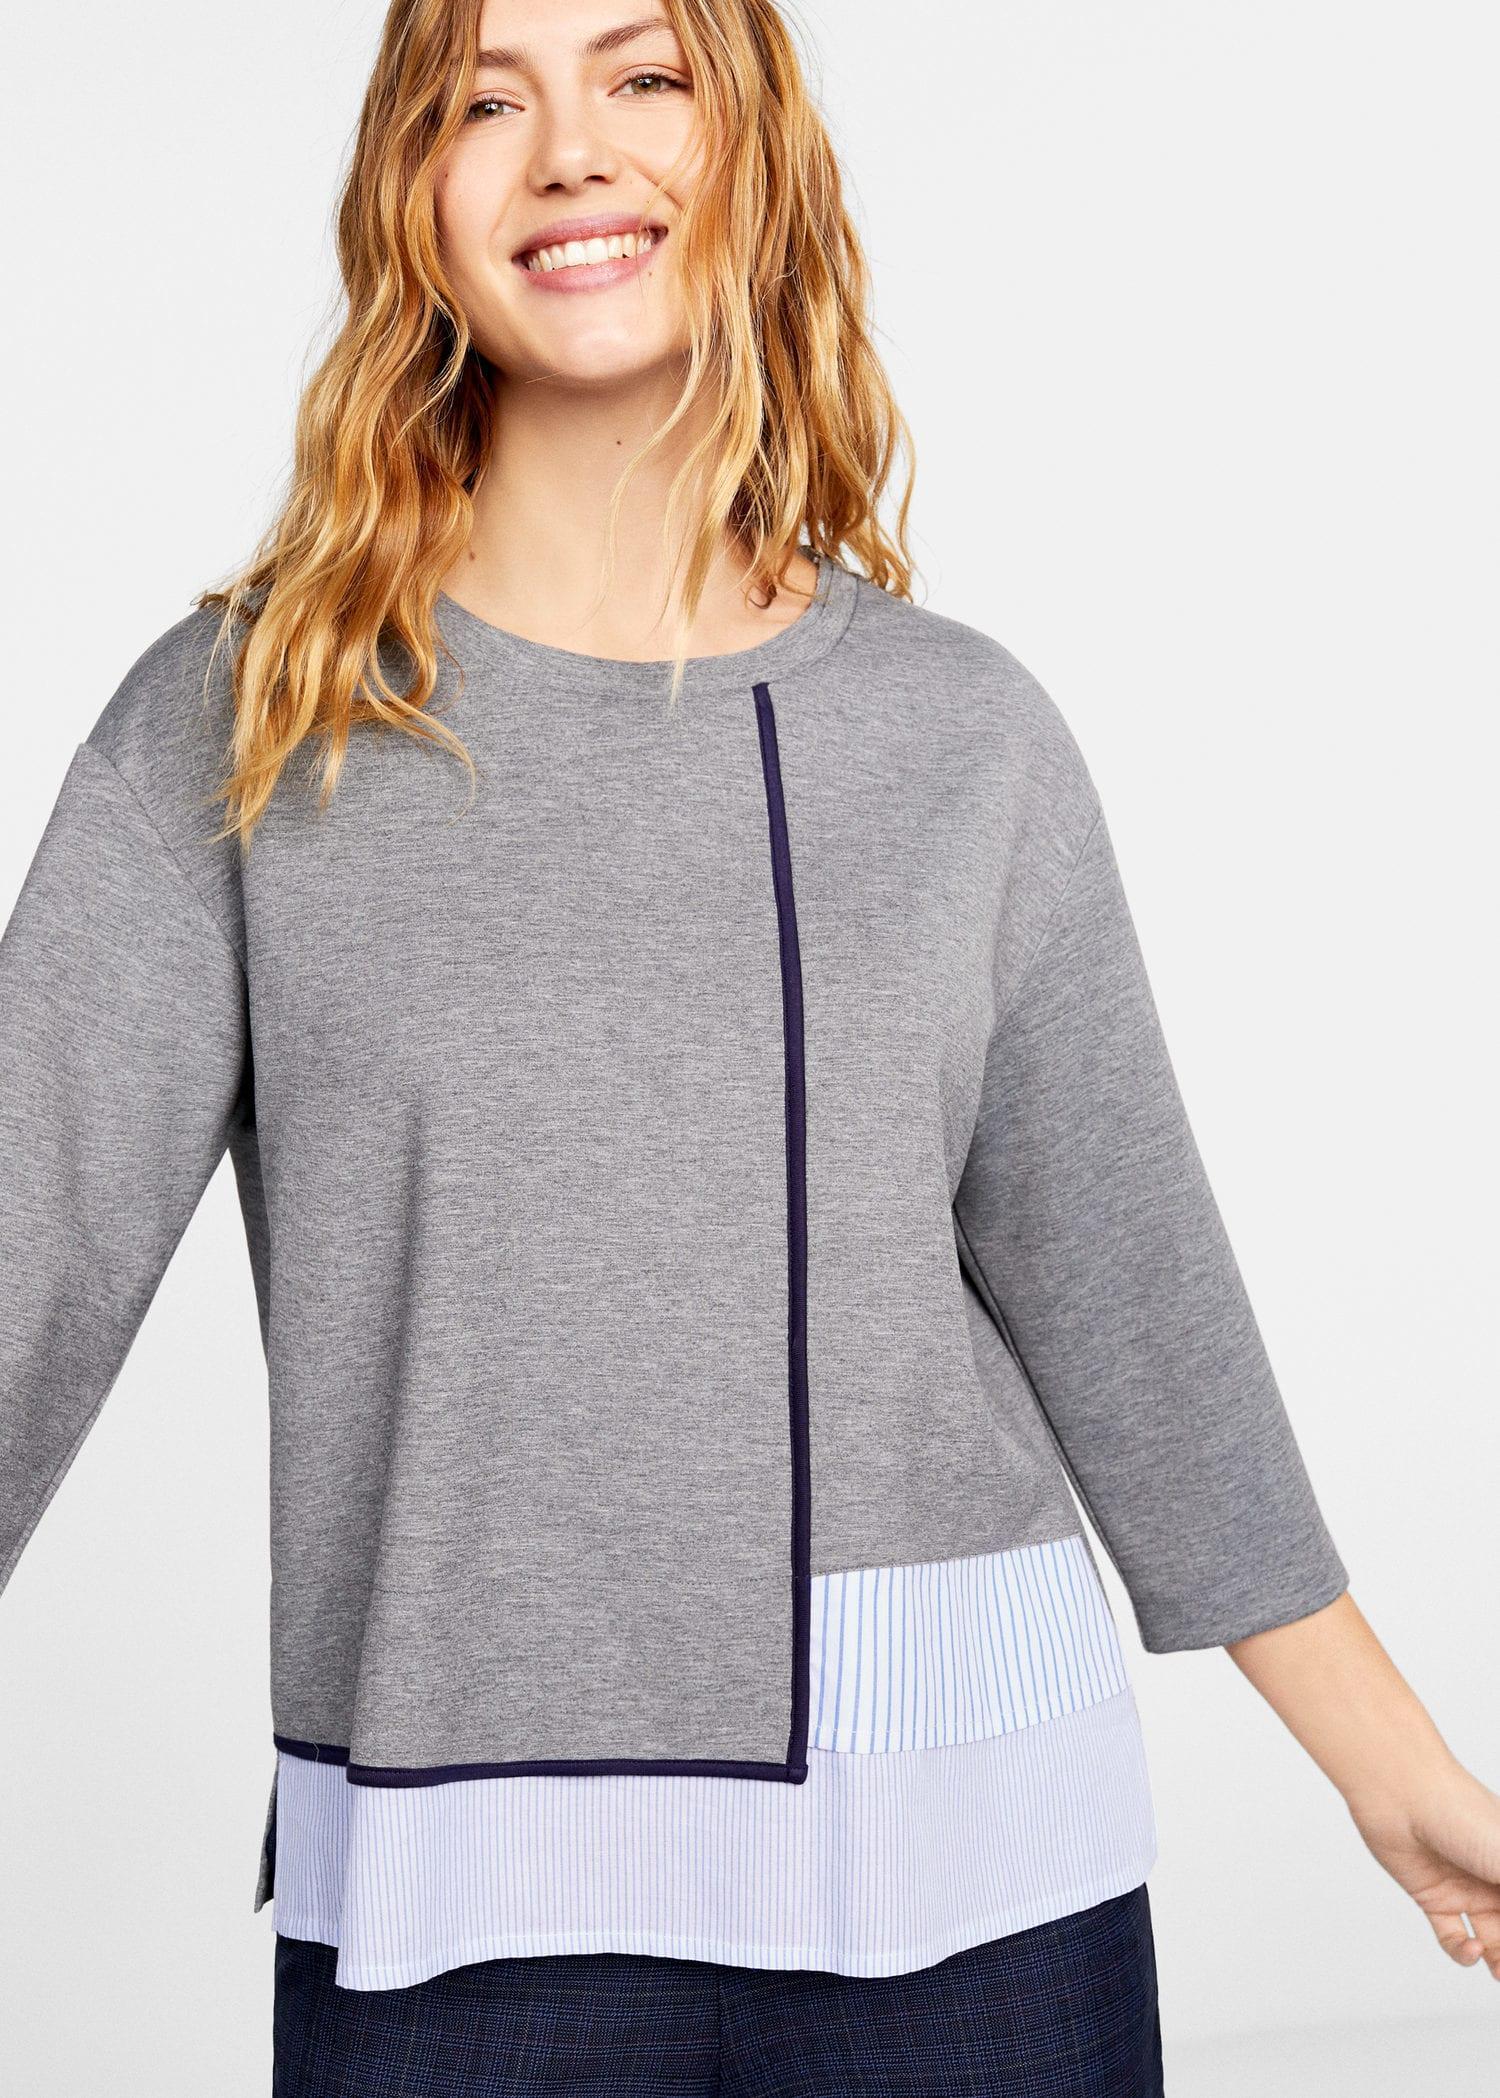 cd5119f19 Violeta by Mango Striped Shirt Hem Sweatshirt in Gray - Lyst